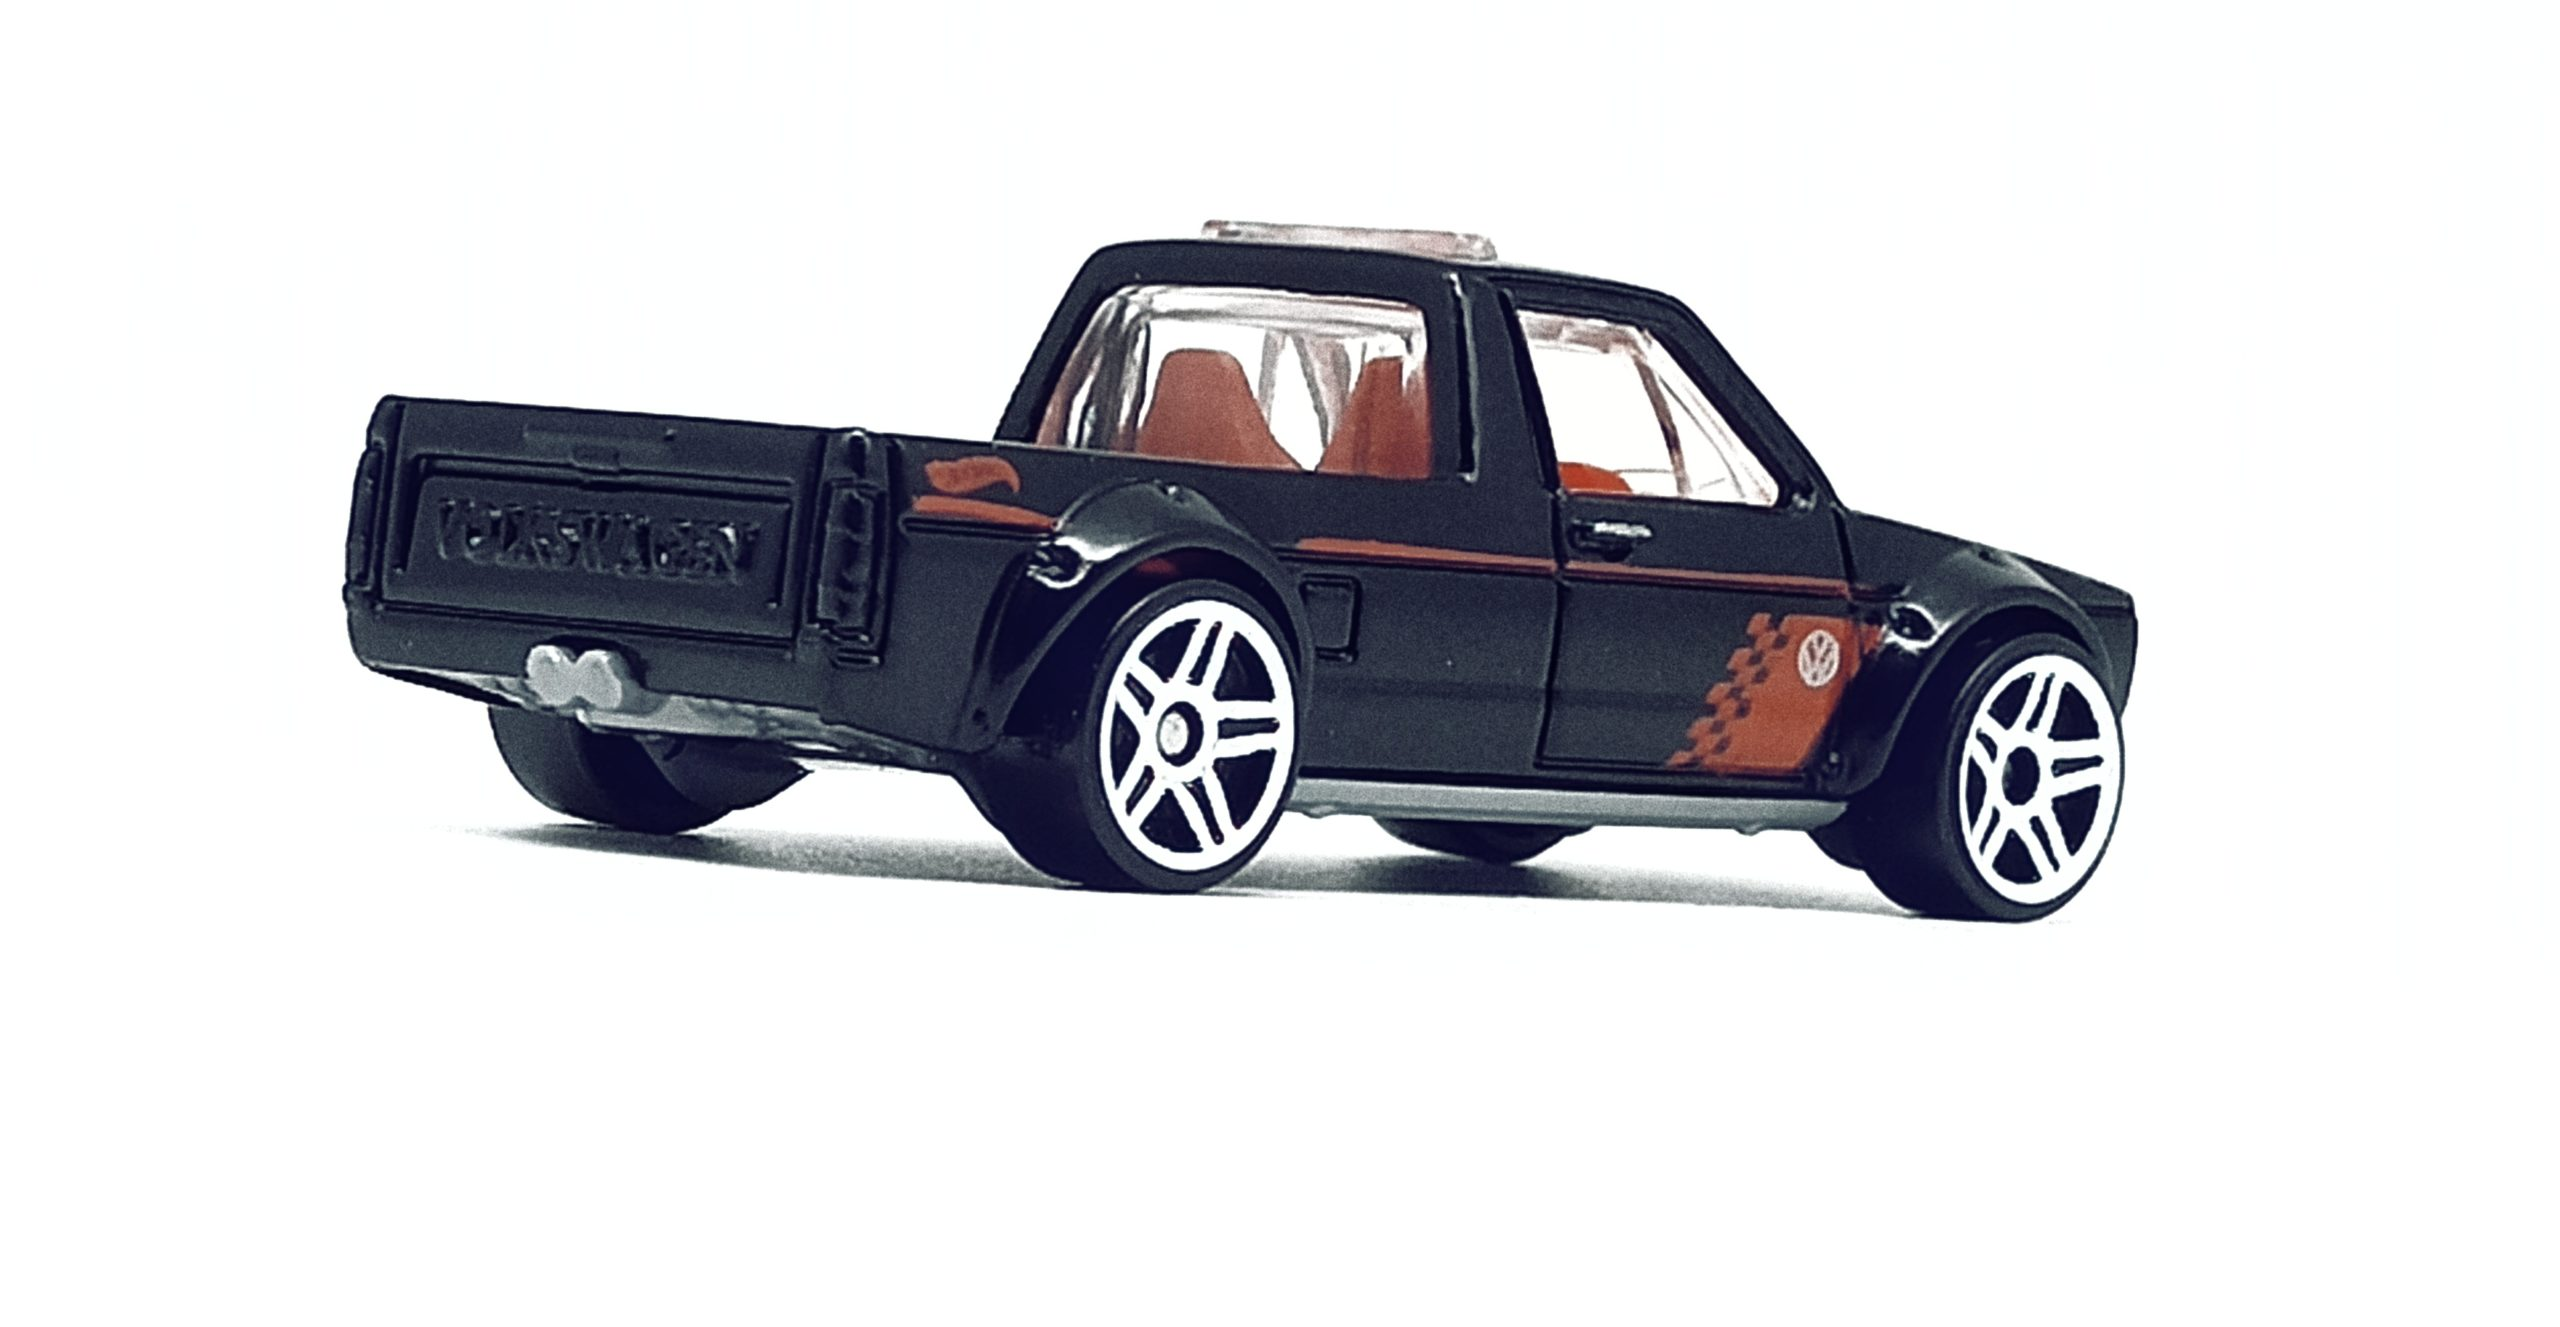 Hot Wheels Volkswagen Caddy (FYG73) 2019 (177/250) Target Red Edition (12/12) VW black side angle